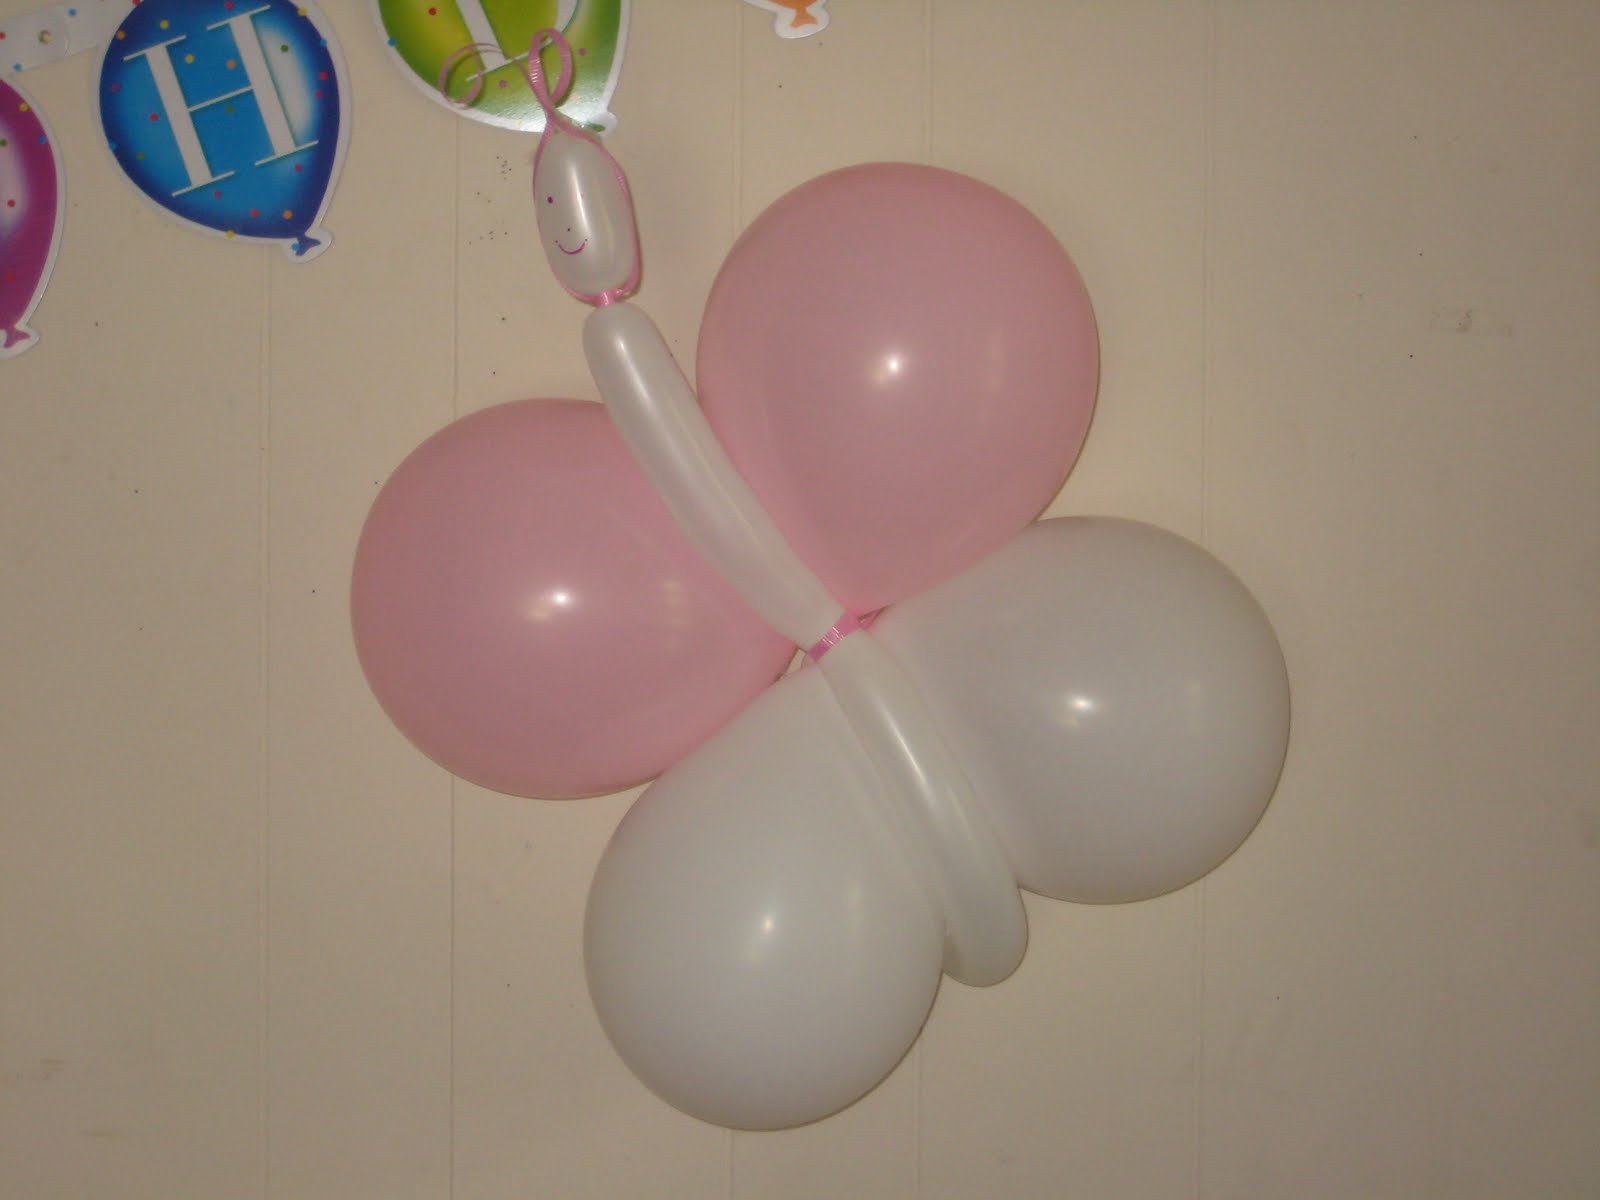 My Avocations: Balloon decoration